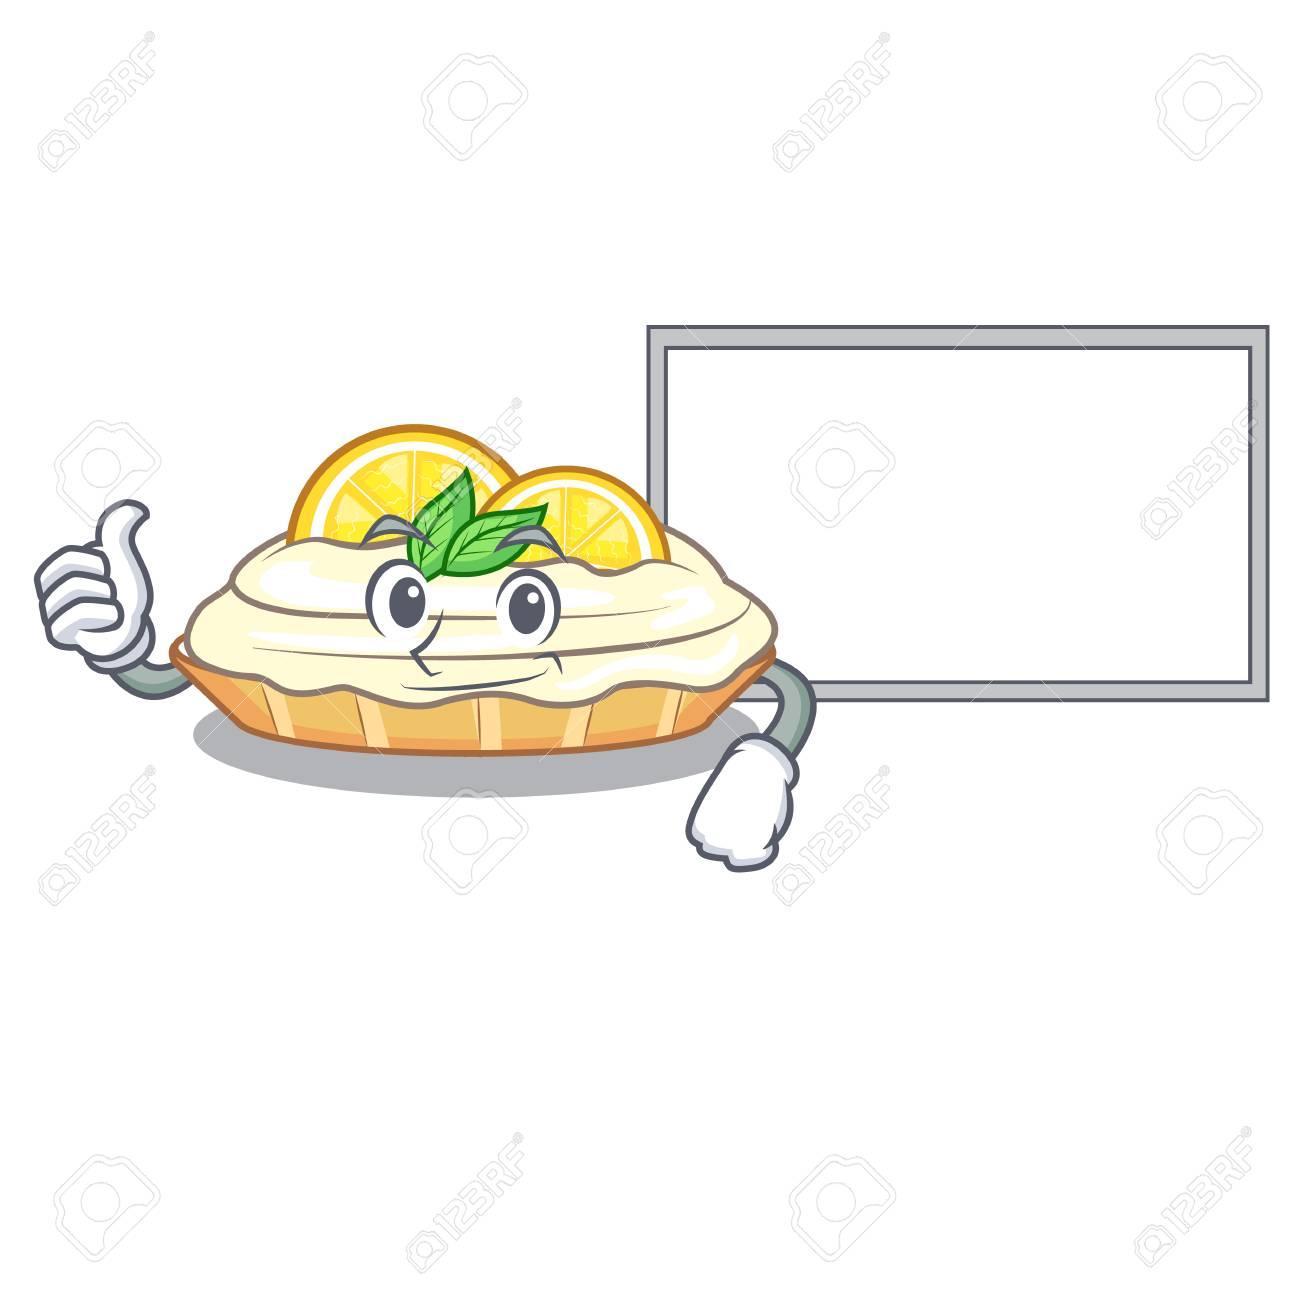 Thumbs Up With Board Cartoon Lemon Cake With Sugar Powder Vector